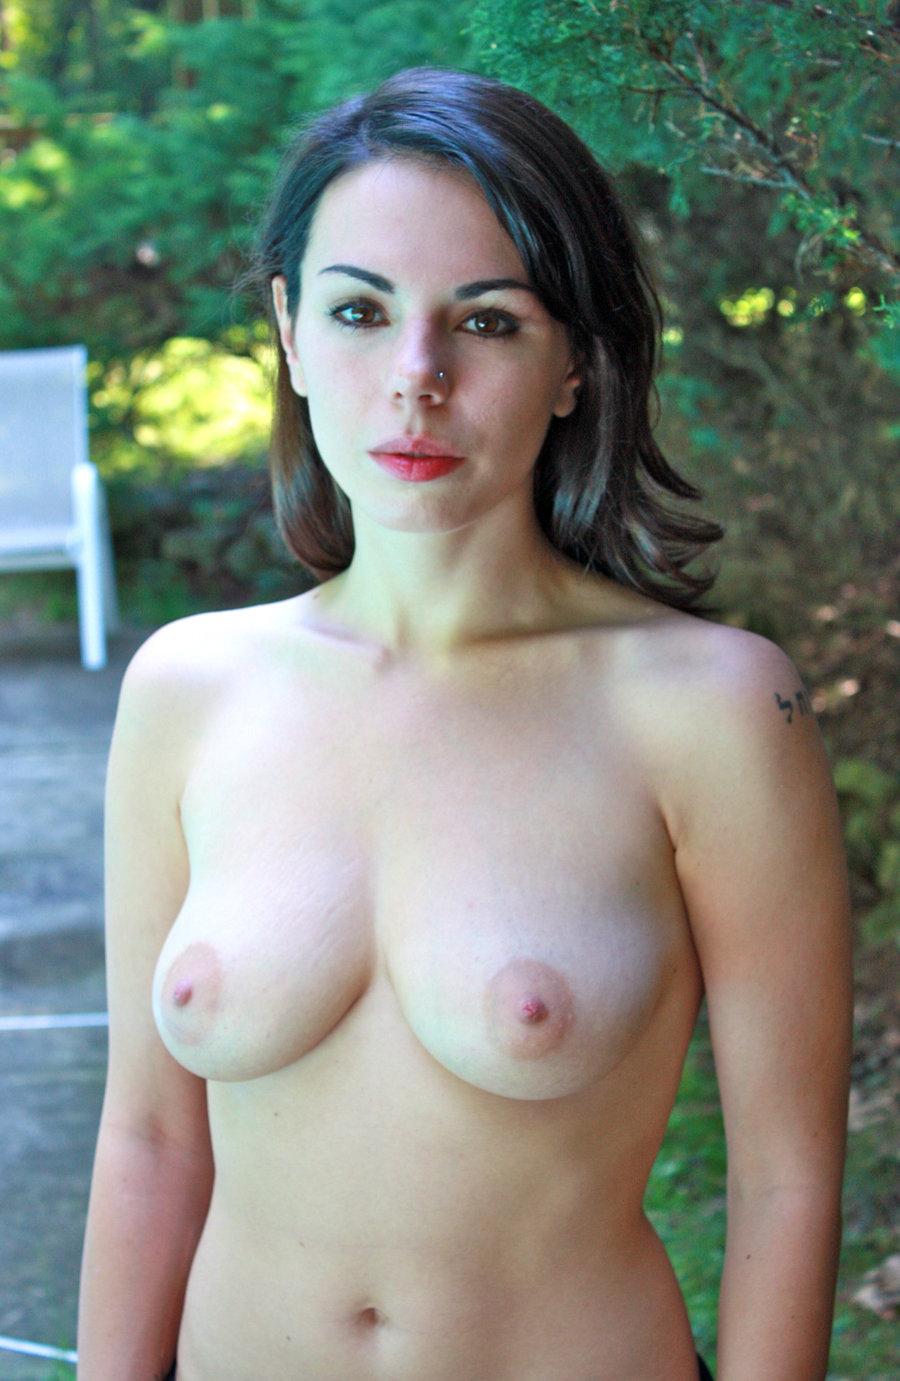 Jessi palmer sex on the street 4